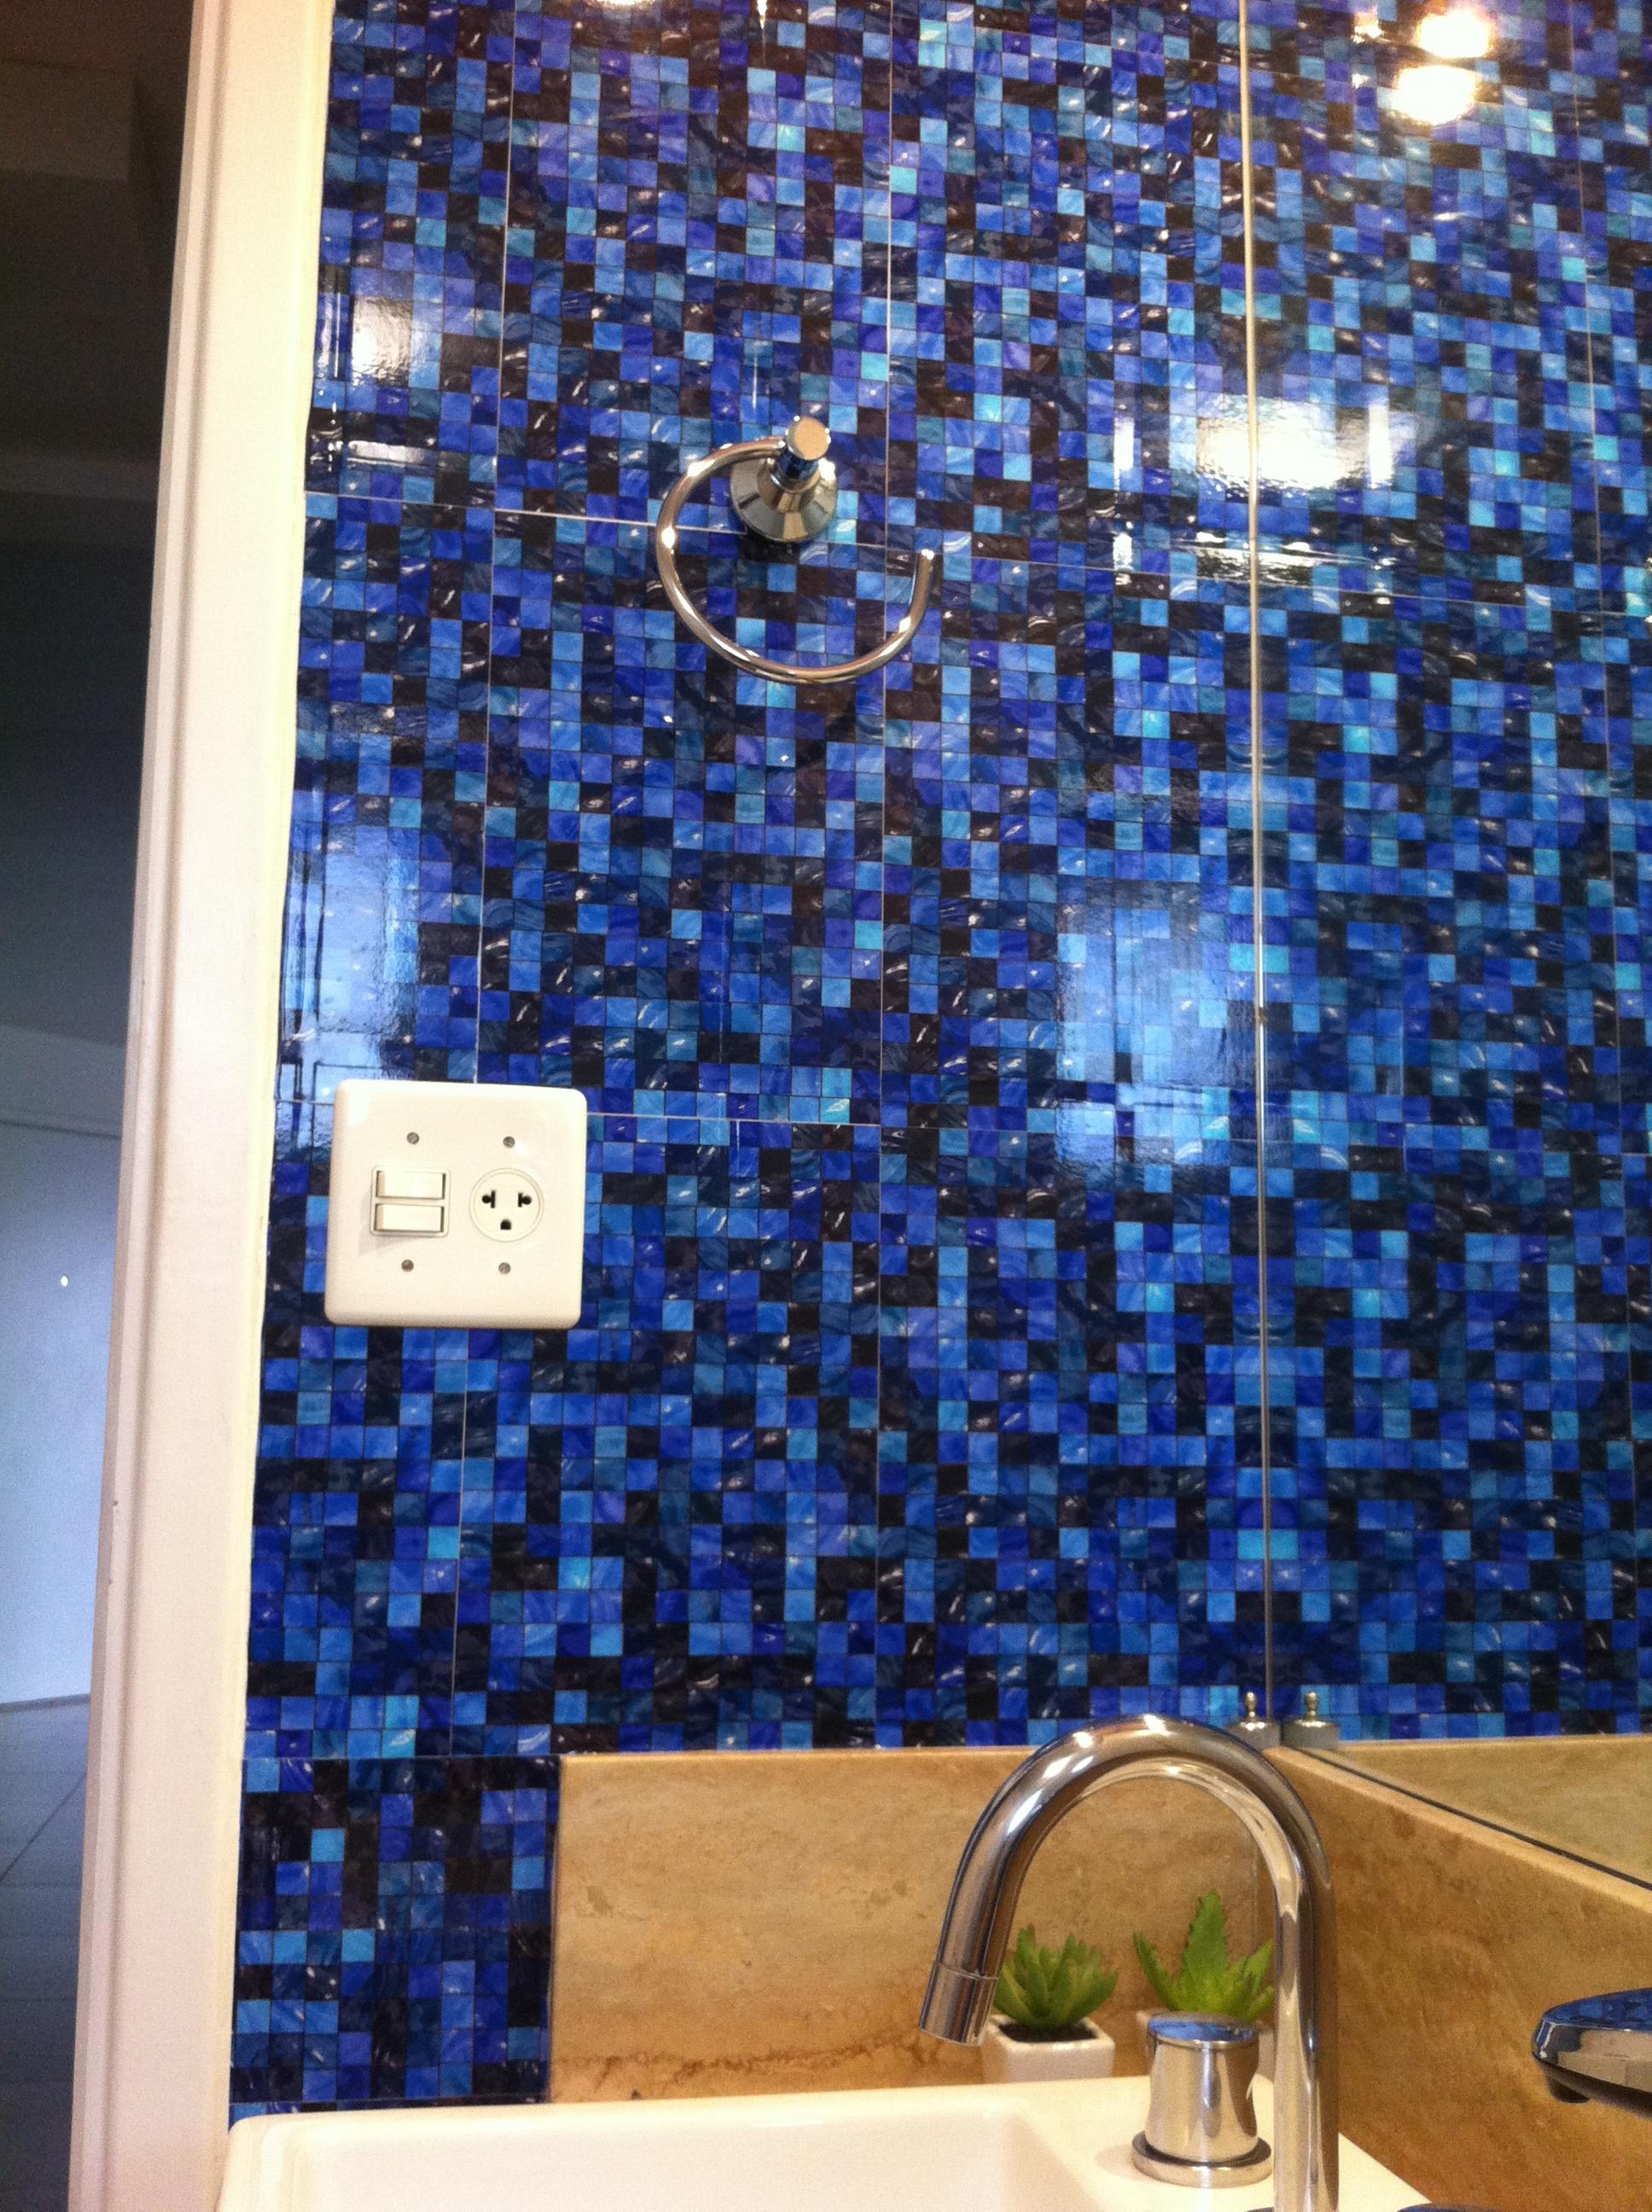 adesivo pastilha azul frete gratis parede kit adesivo pastilha azul  #2463A7 1936x2592 Banheiro Com Pastilha Azul E Branco